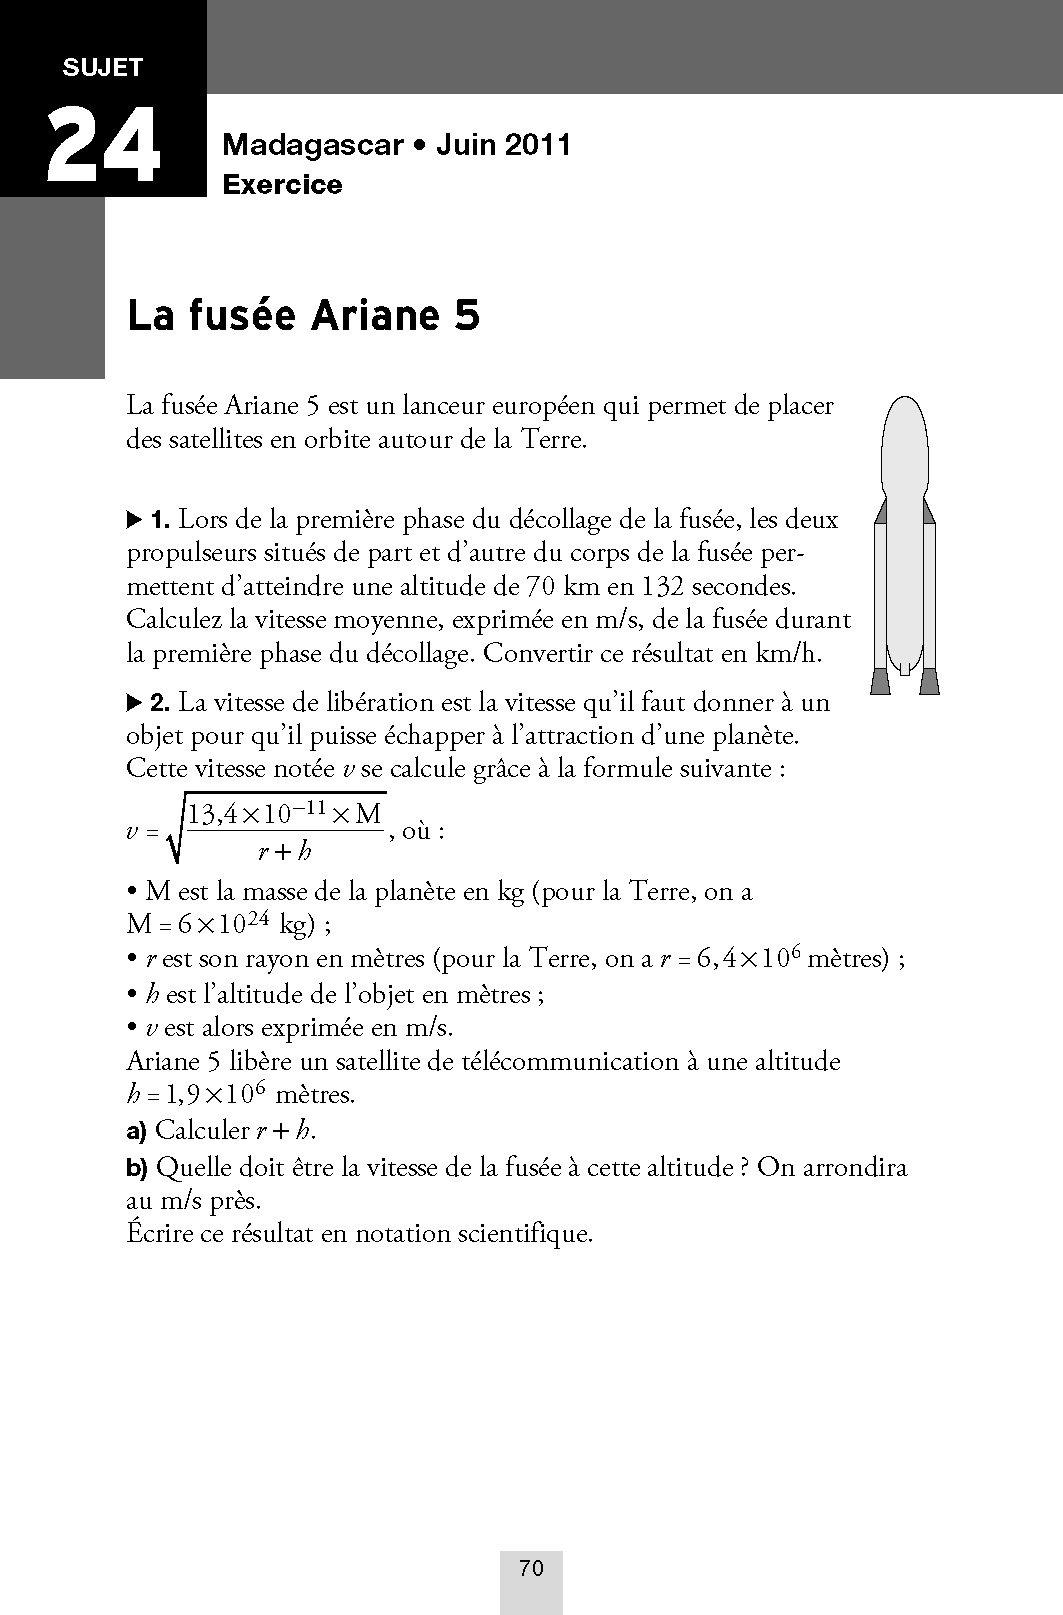 Annales Annabrevet 2014 Maths: Amazon.es: Bernard Demeillers: Libros en idiomas extranjeros